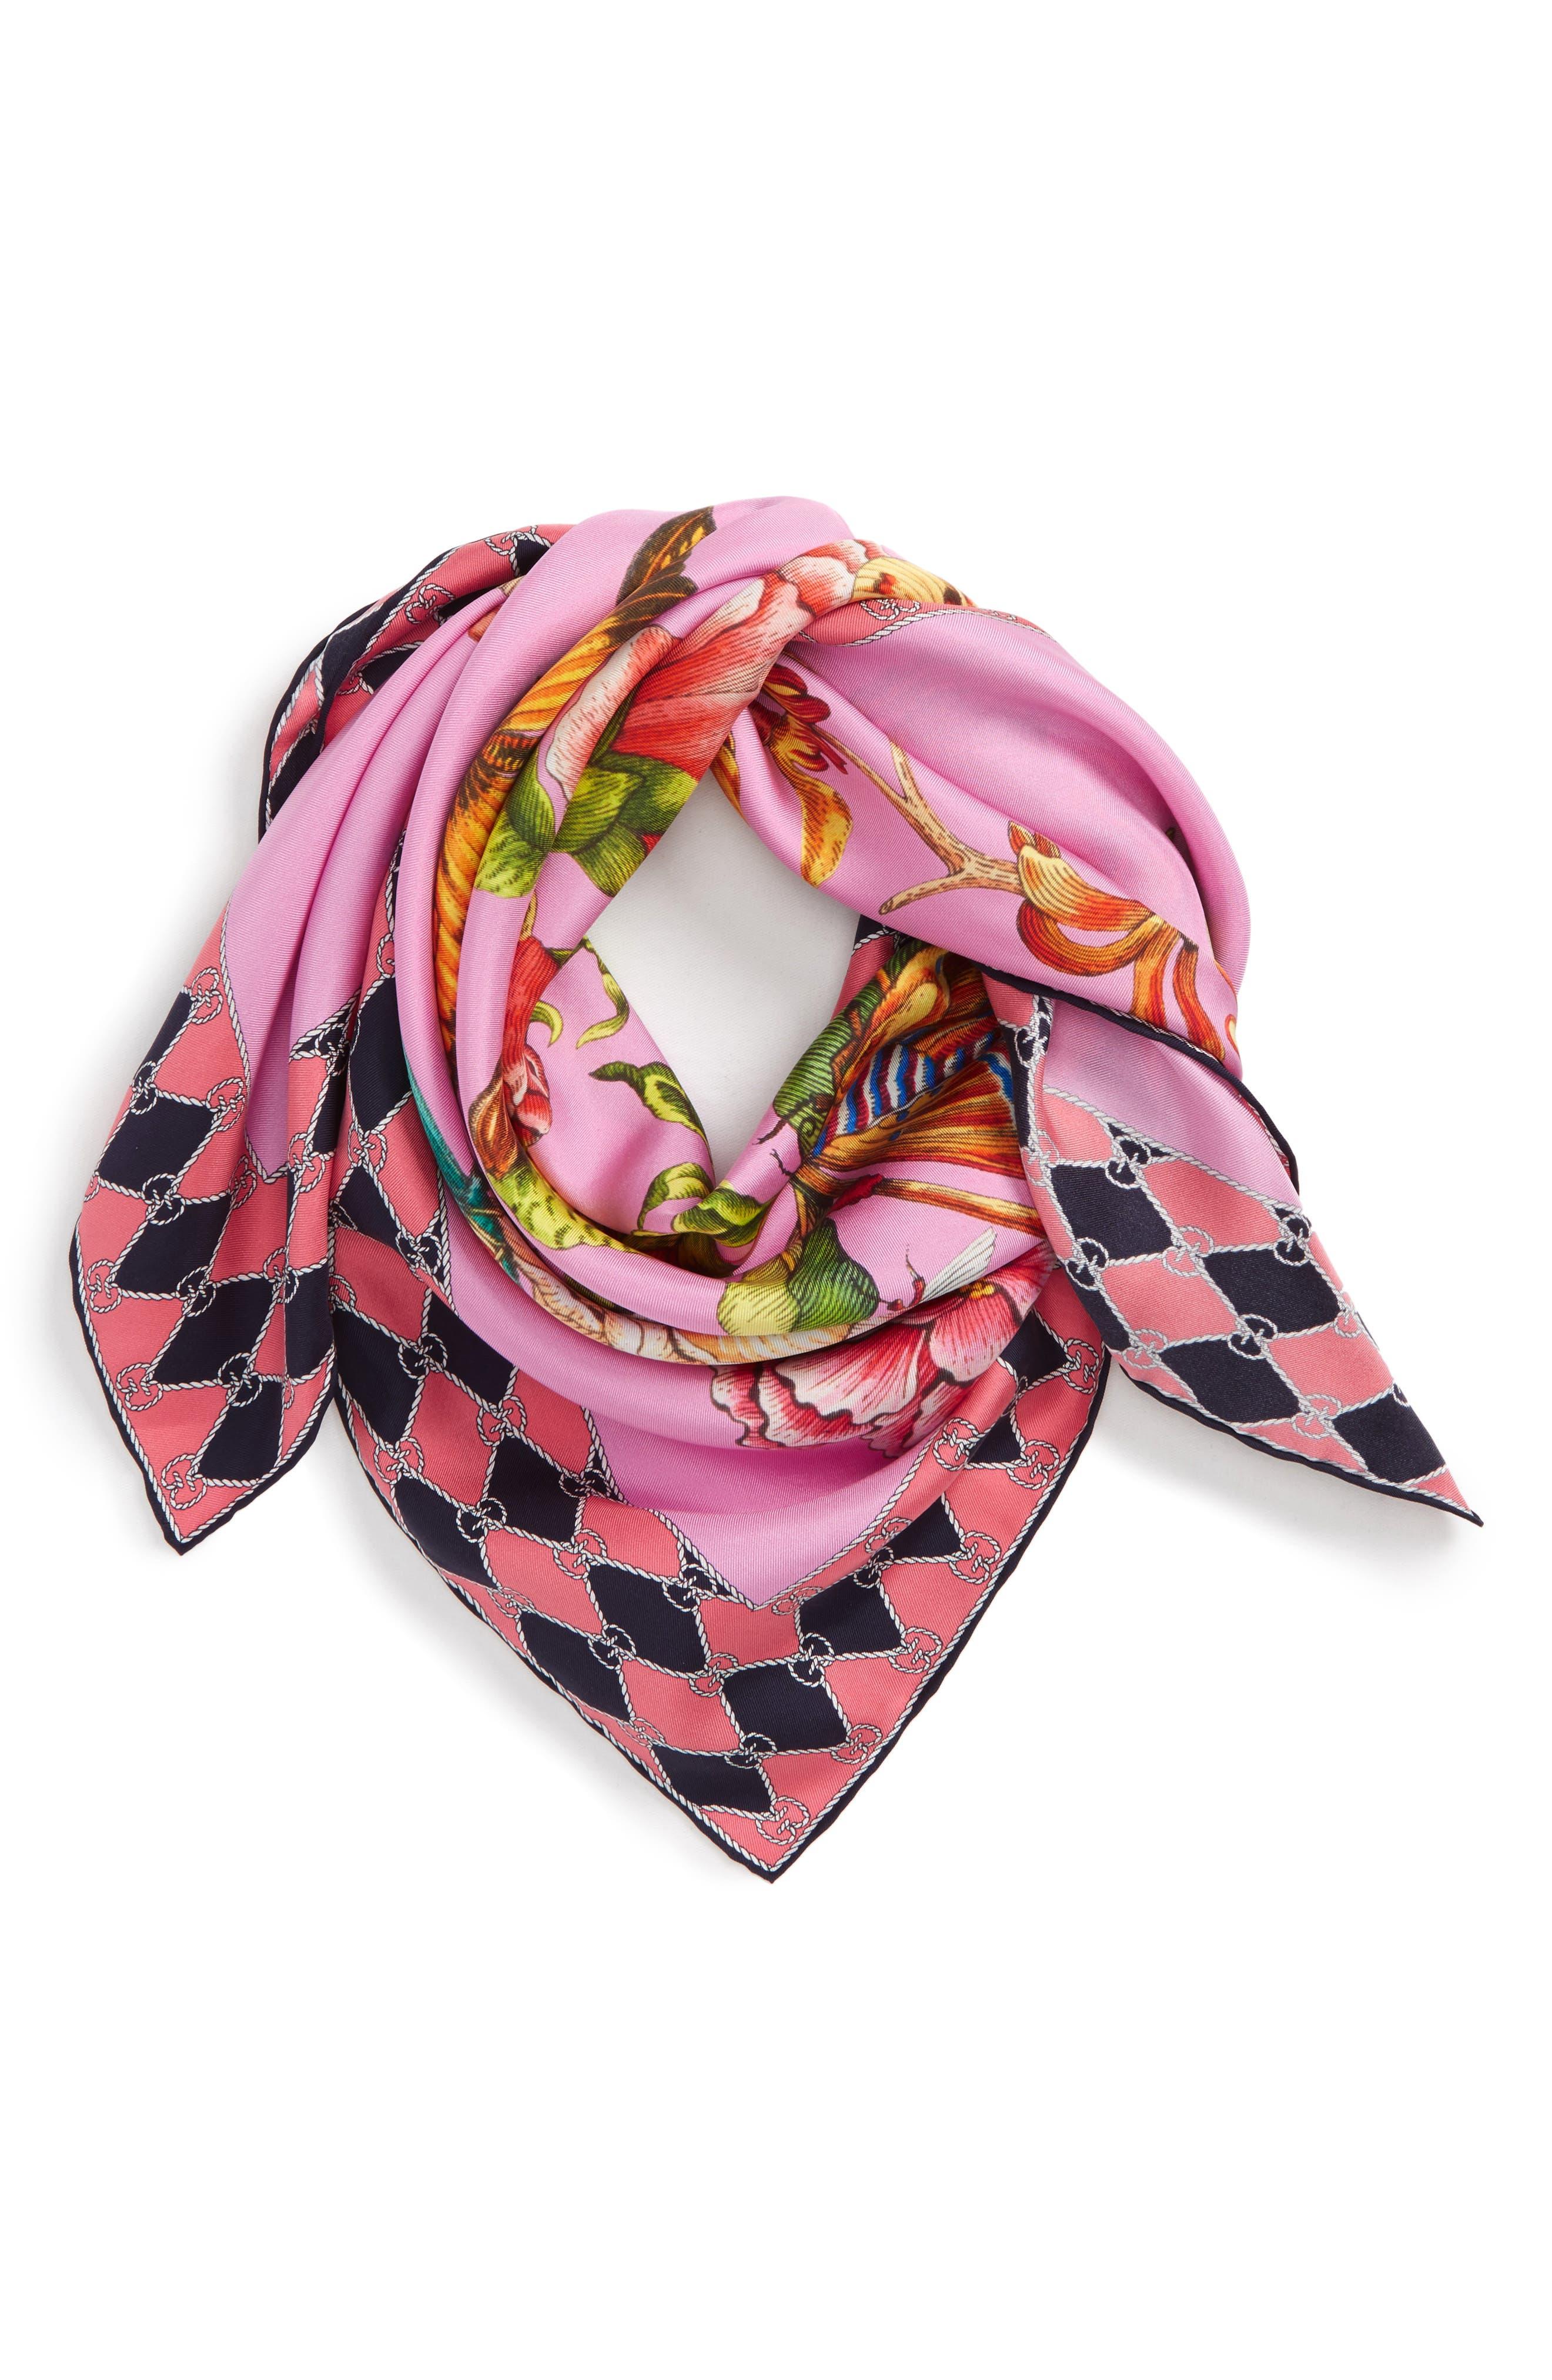 Foulard Chane Bouquet Silk Scarf,                             Alternate thumbnail 2, color,                             PINK